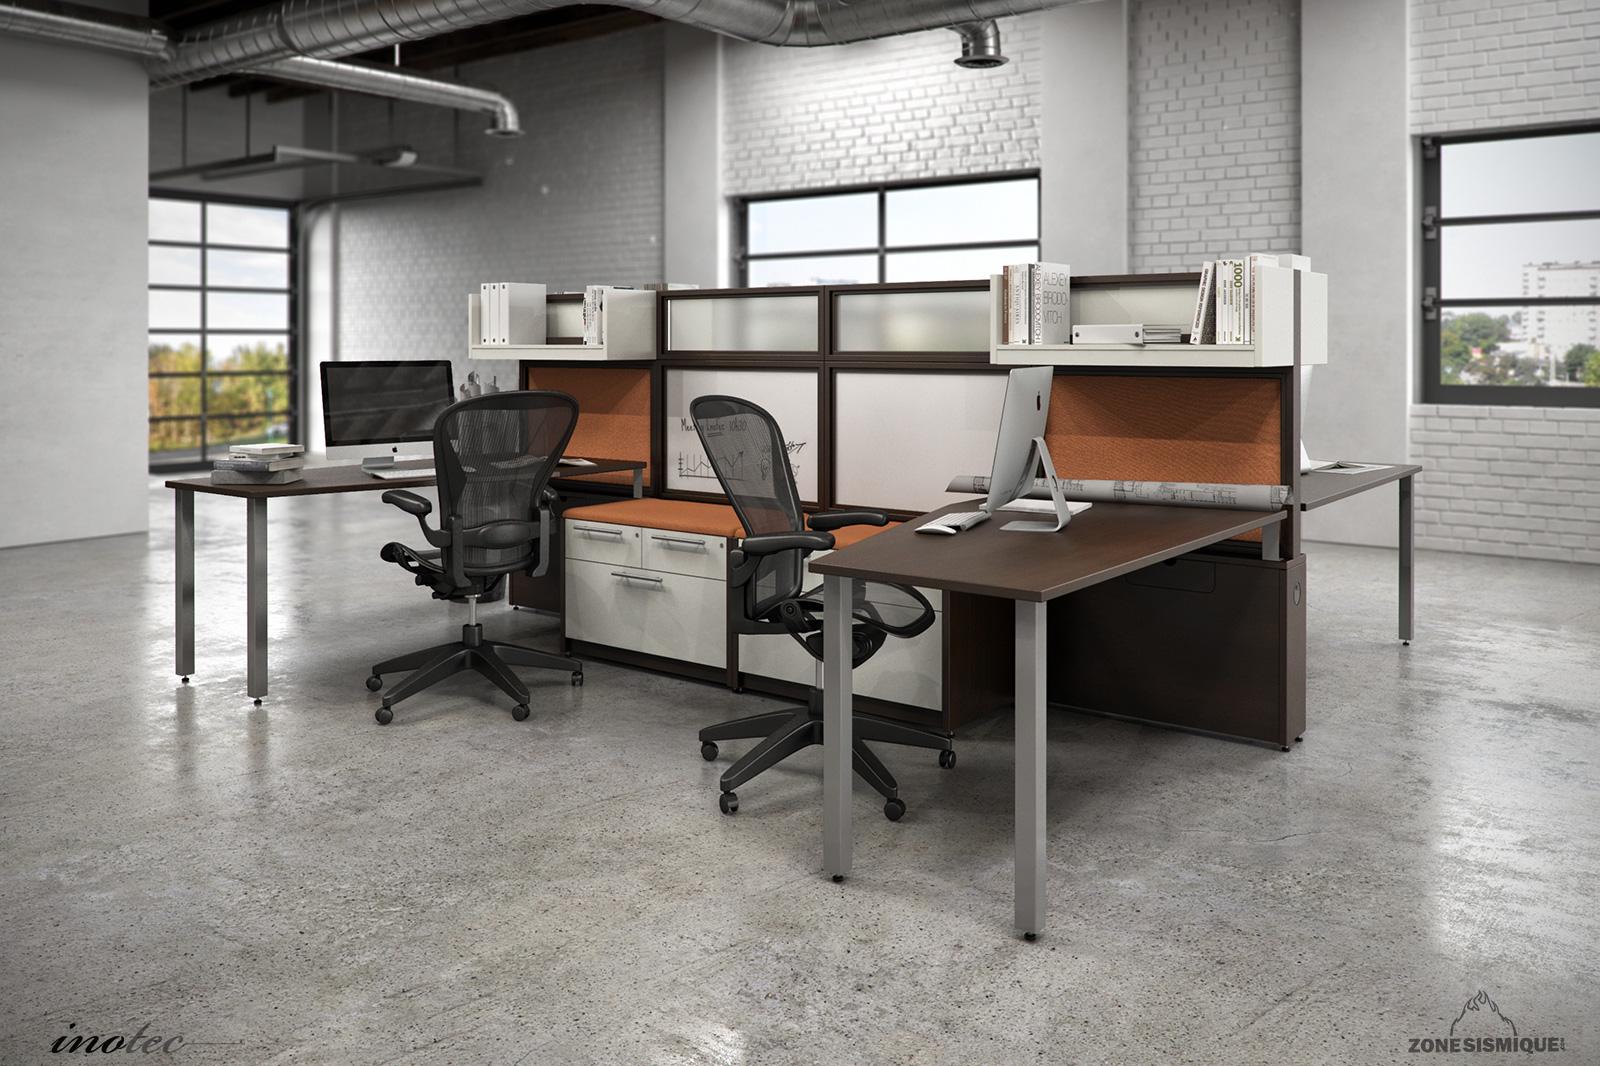 zone sismique inotec scene bureau 3d ypc 603 v1 zone sismique design industriel 3d. Black Bedroom Furniture Sets. Home Design Ideas